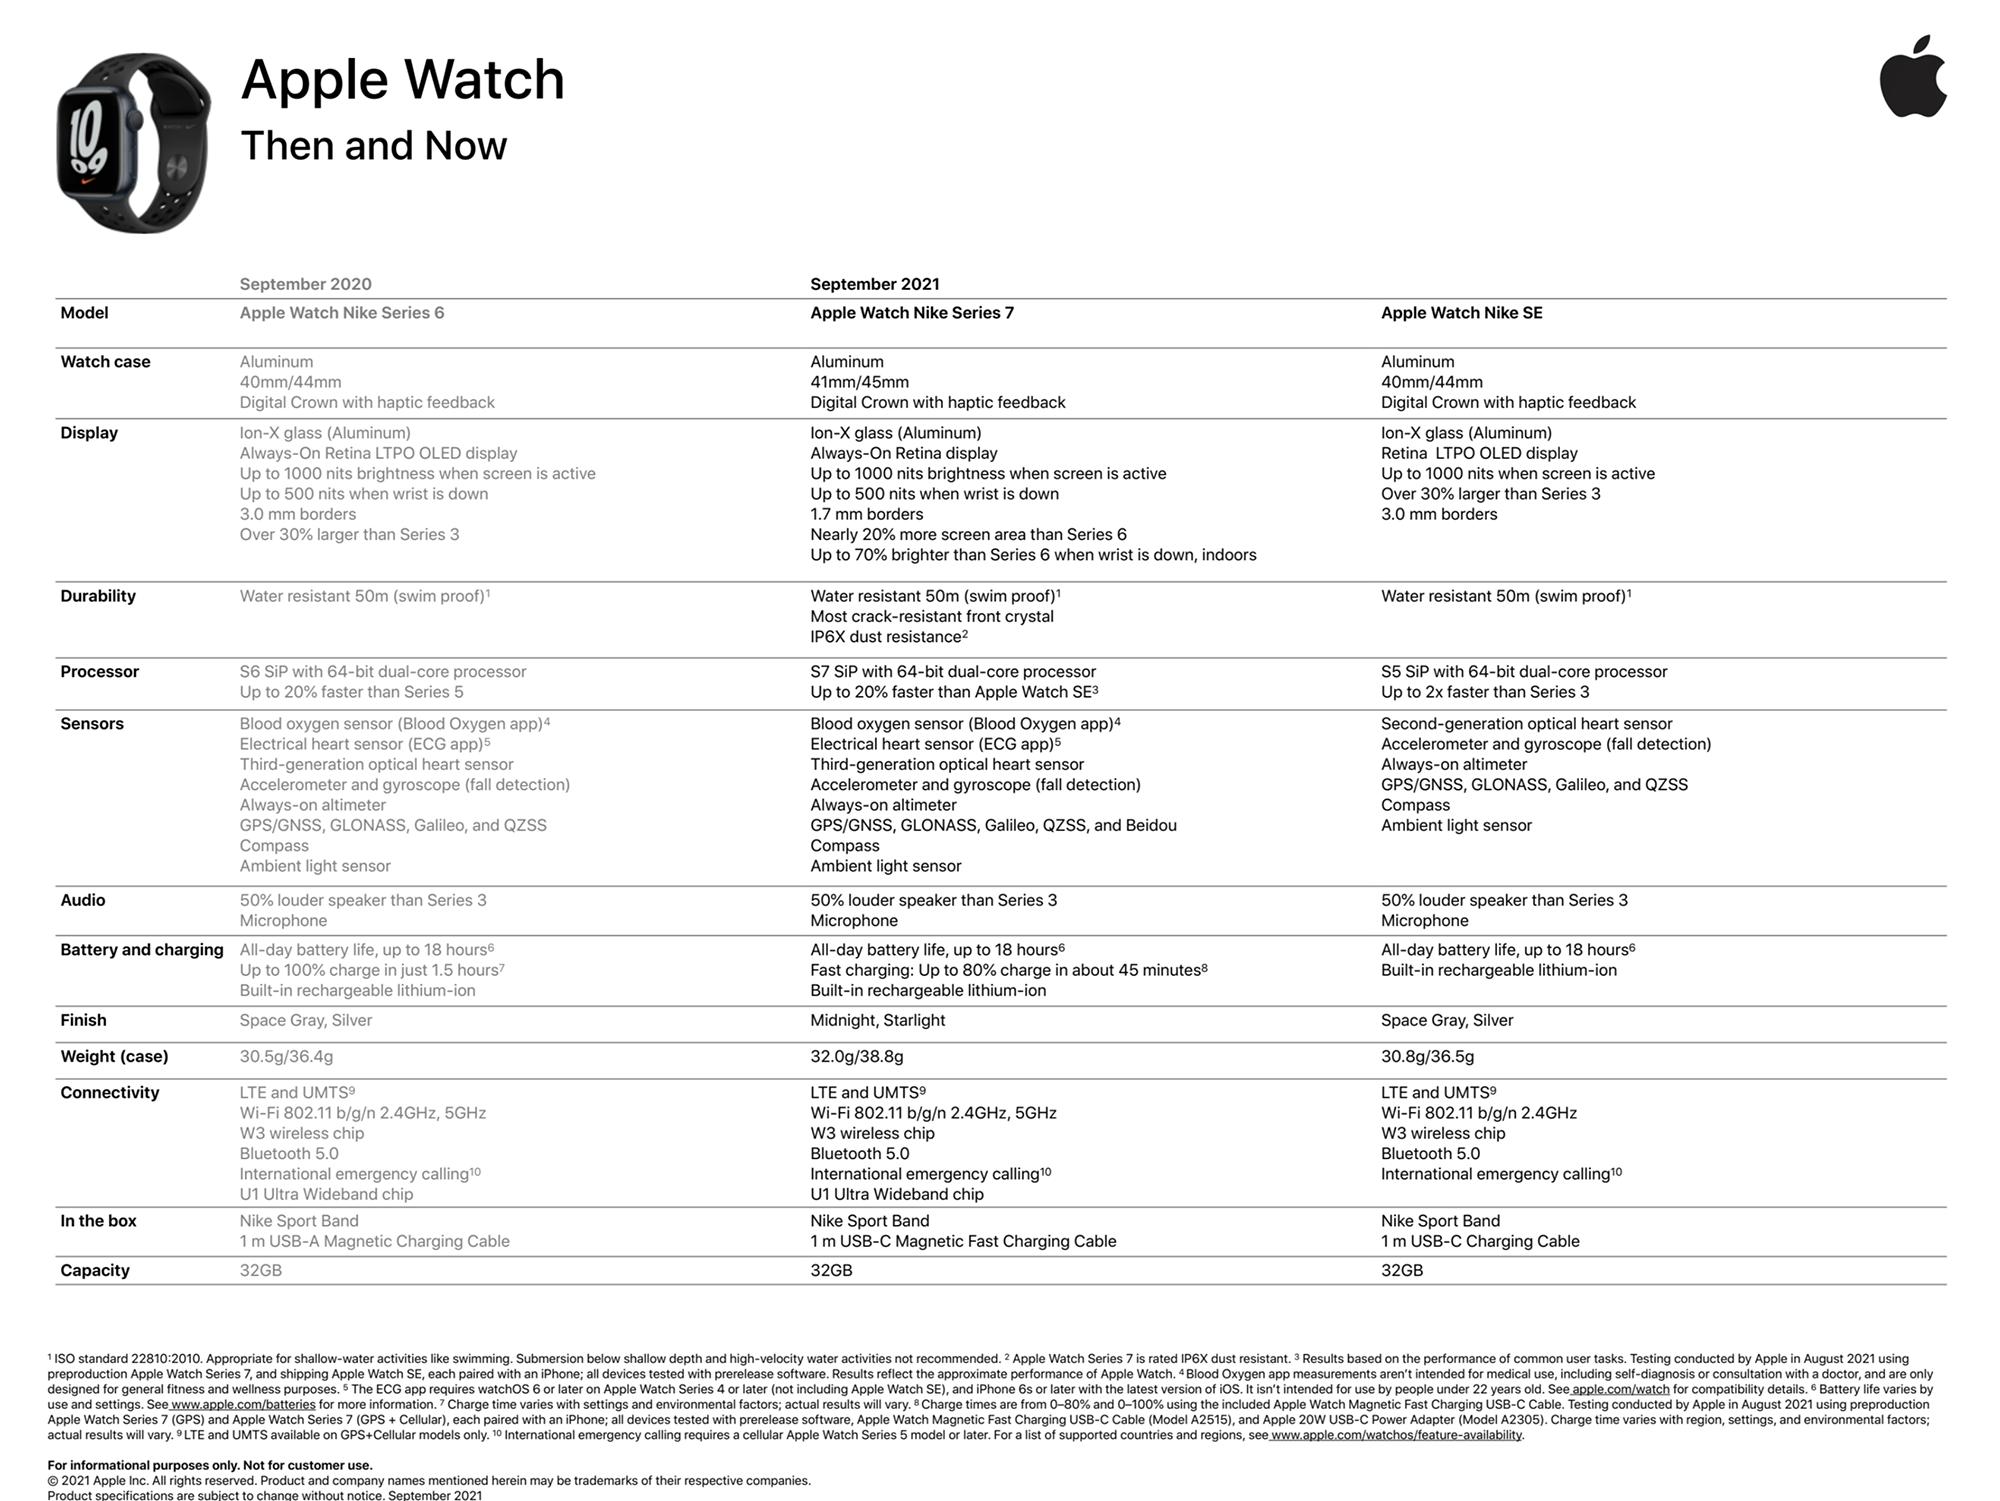 Specifiche dell'Apple Watch Serie 7